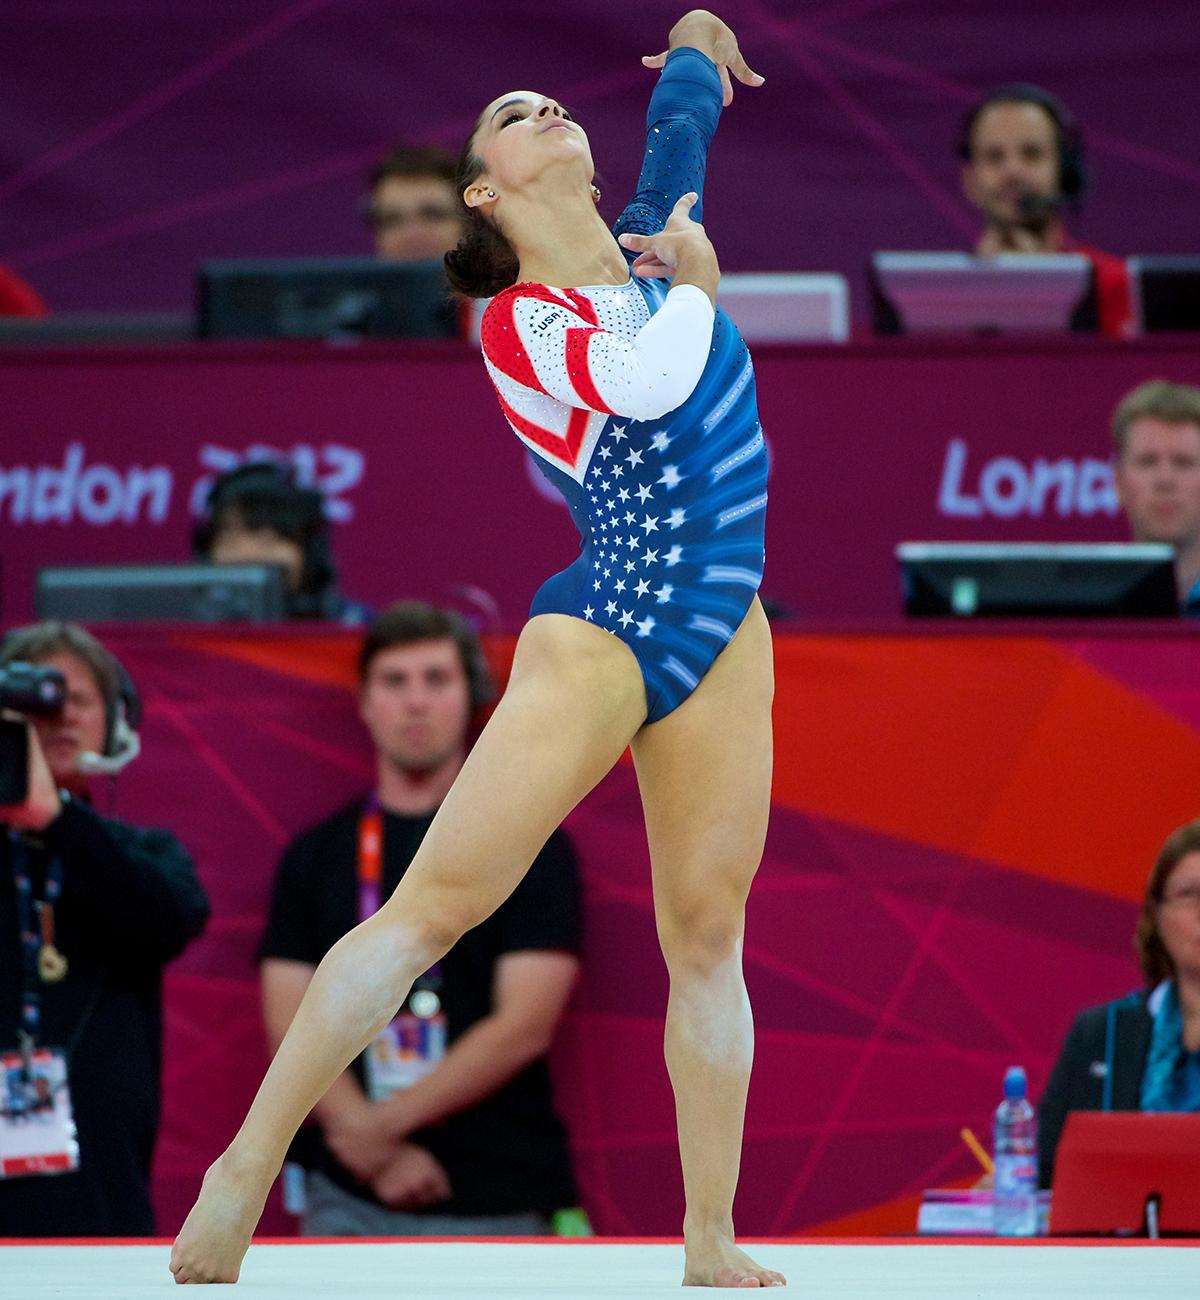 Photo by John Cheng/USA Gymnastics